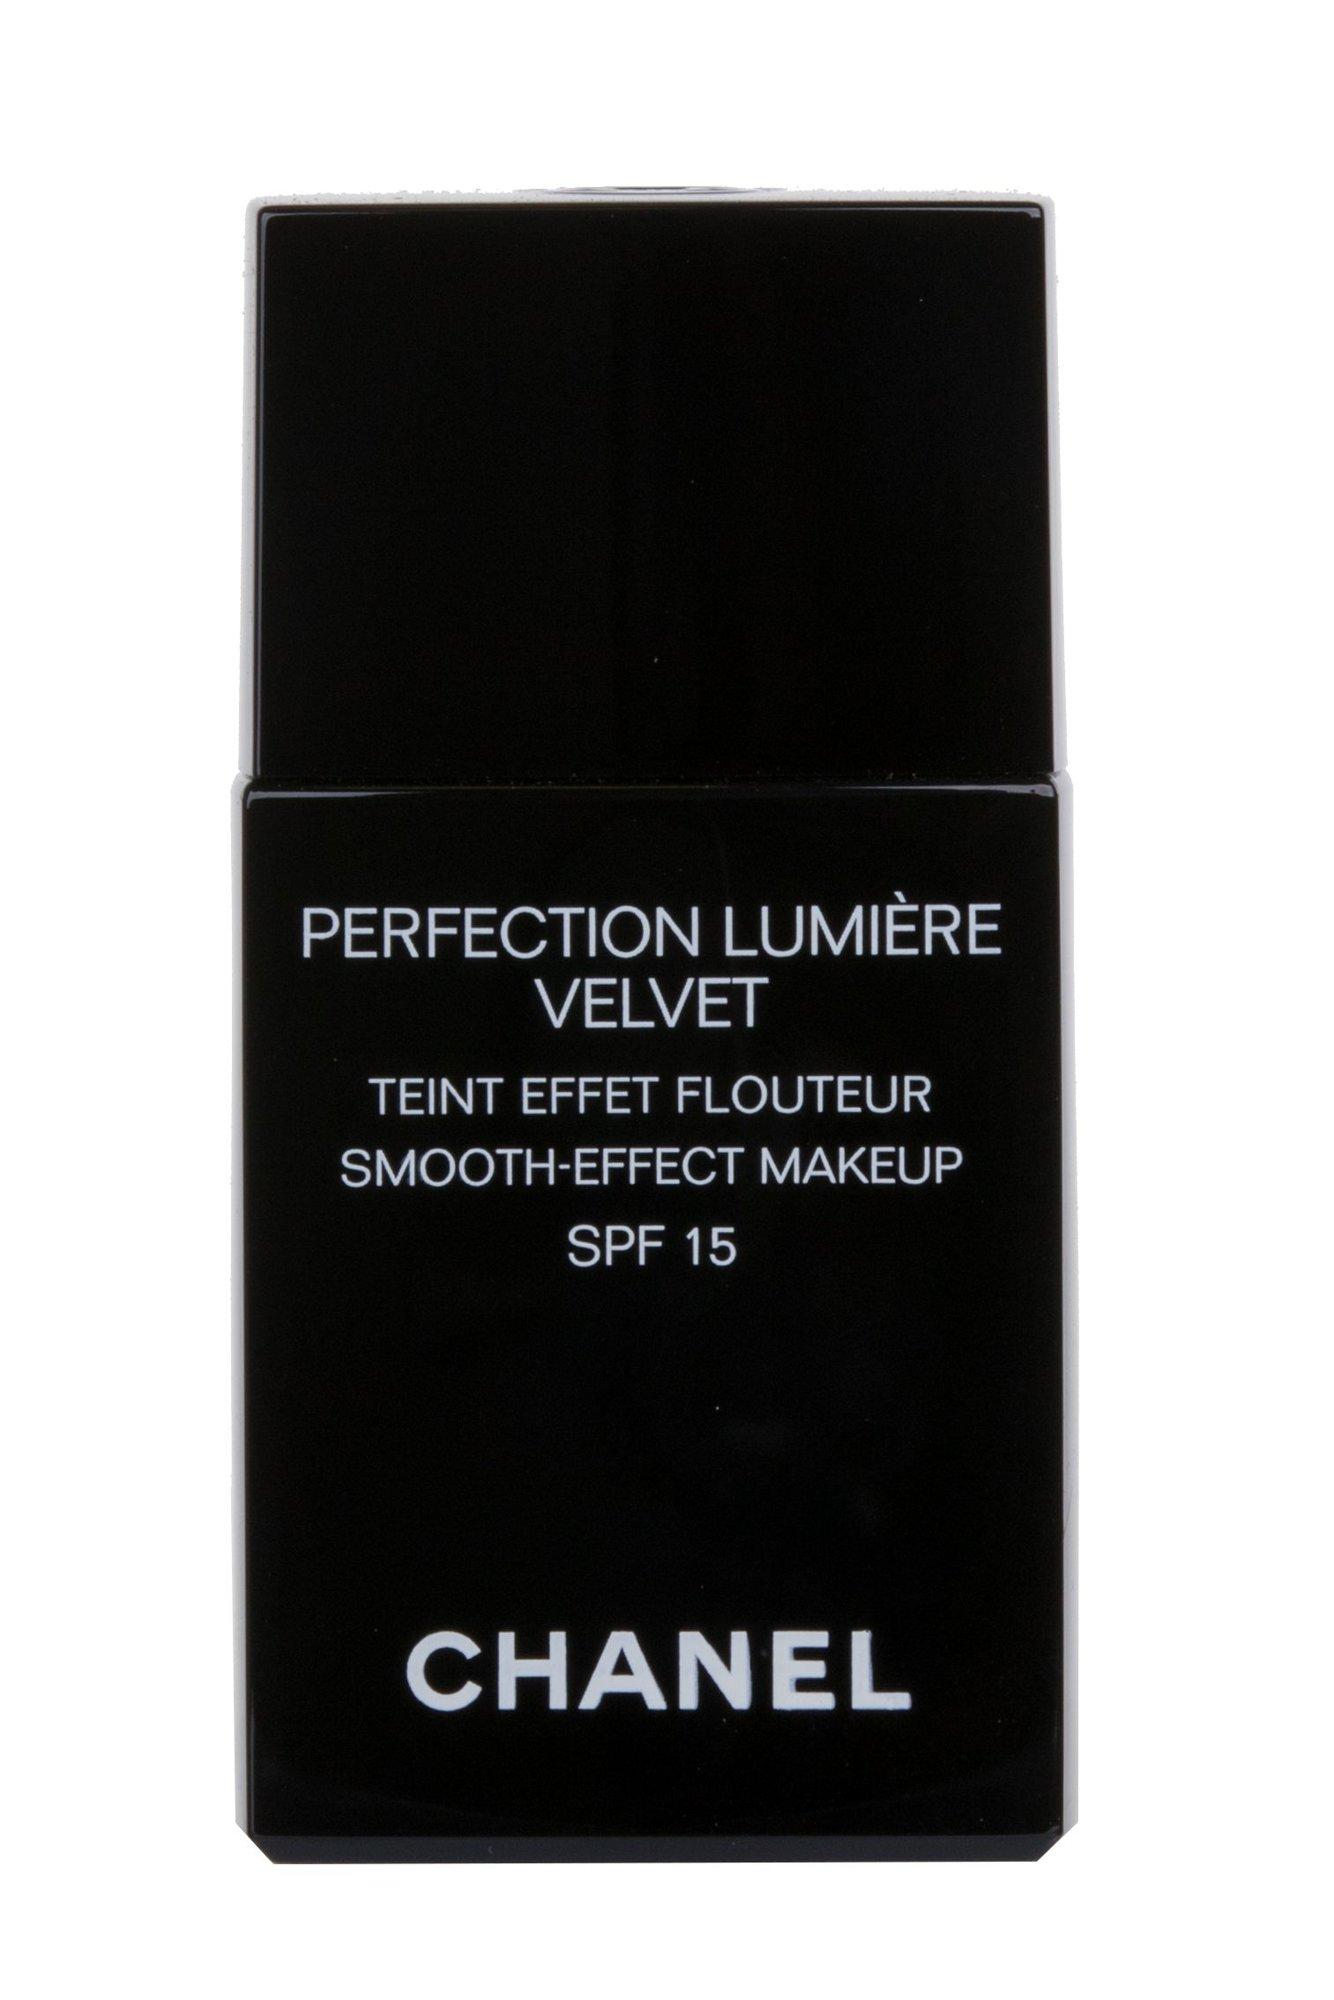 Chanel Perfection Lumiére Makeup 30ml 10 Beige